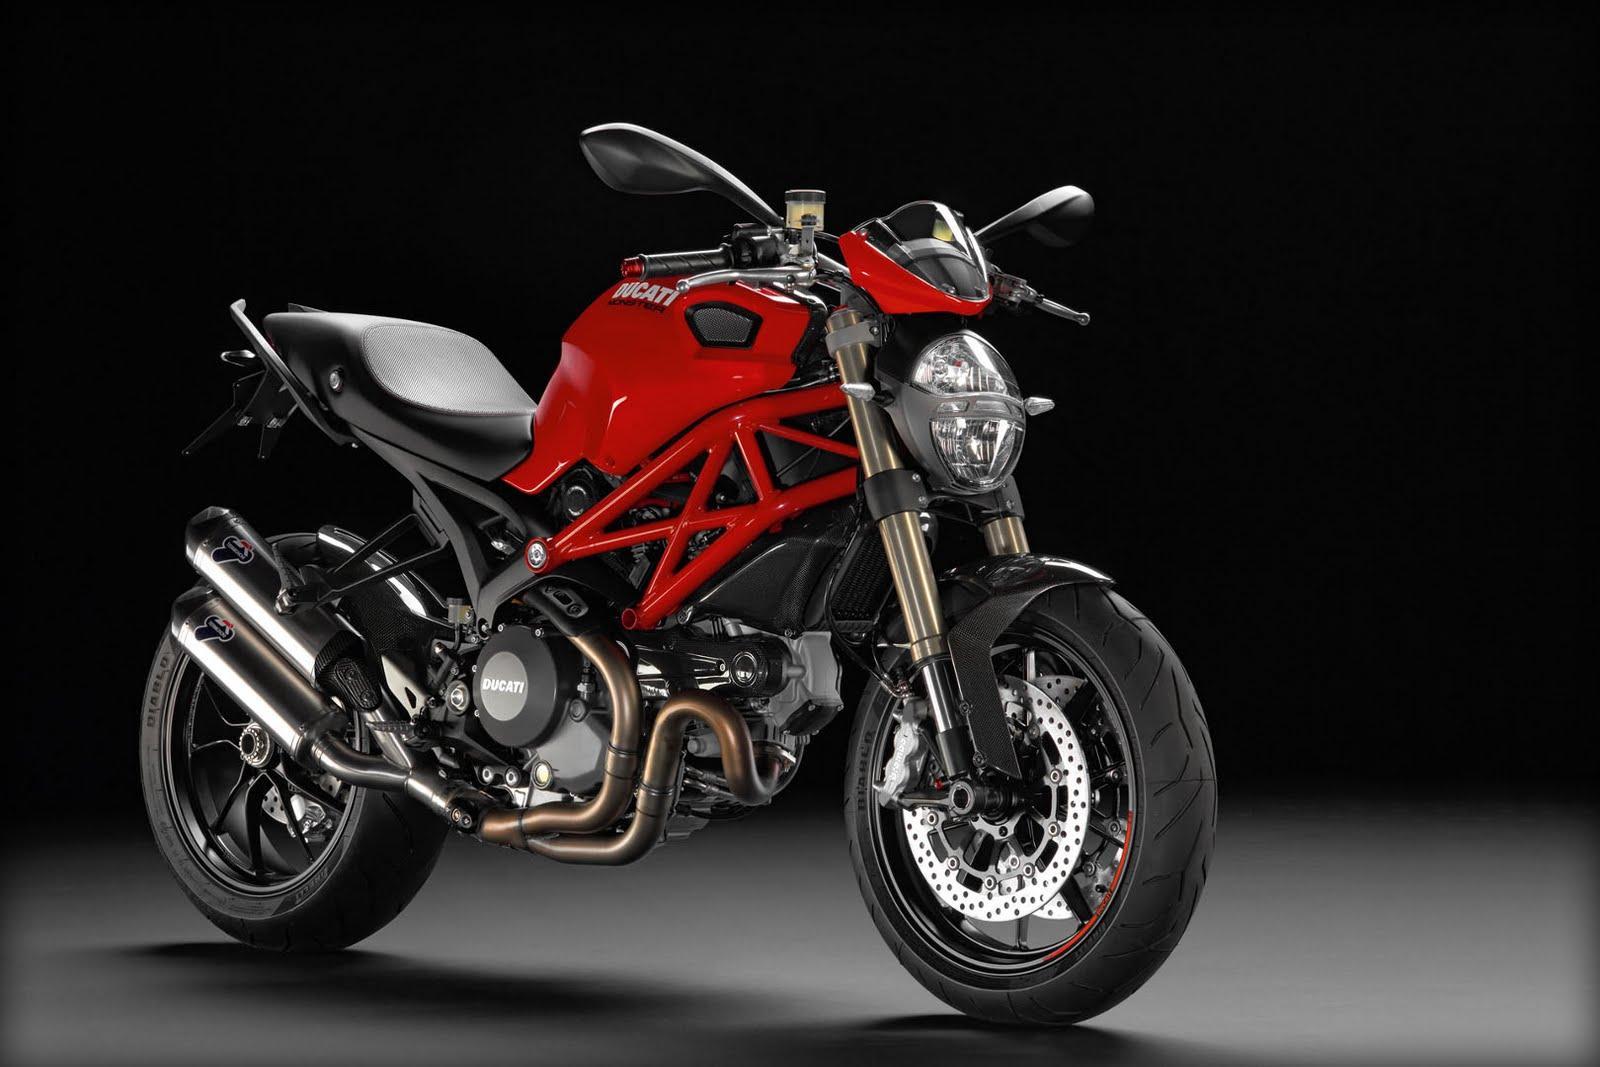 http://3.bp.blogspot.com/-E5gr4uoJ0eI/TmXHkos9EyI/AAAAAAAAACQ/x94KCtkmHiE/s1600/Ducati_Monster_1100_EVO_2011_1620x1080_Front_Angle.jpg